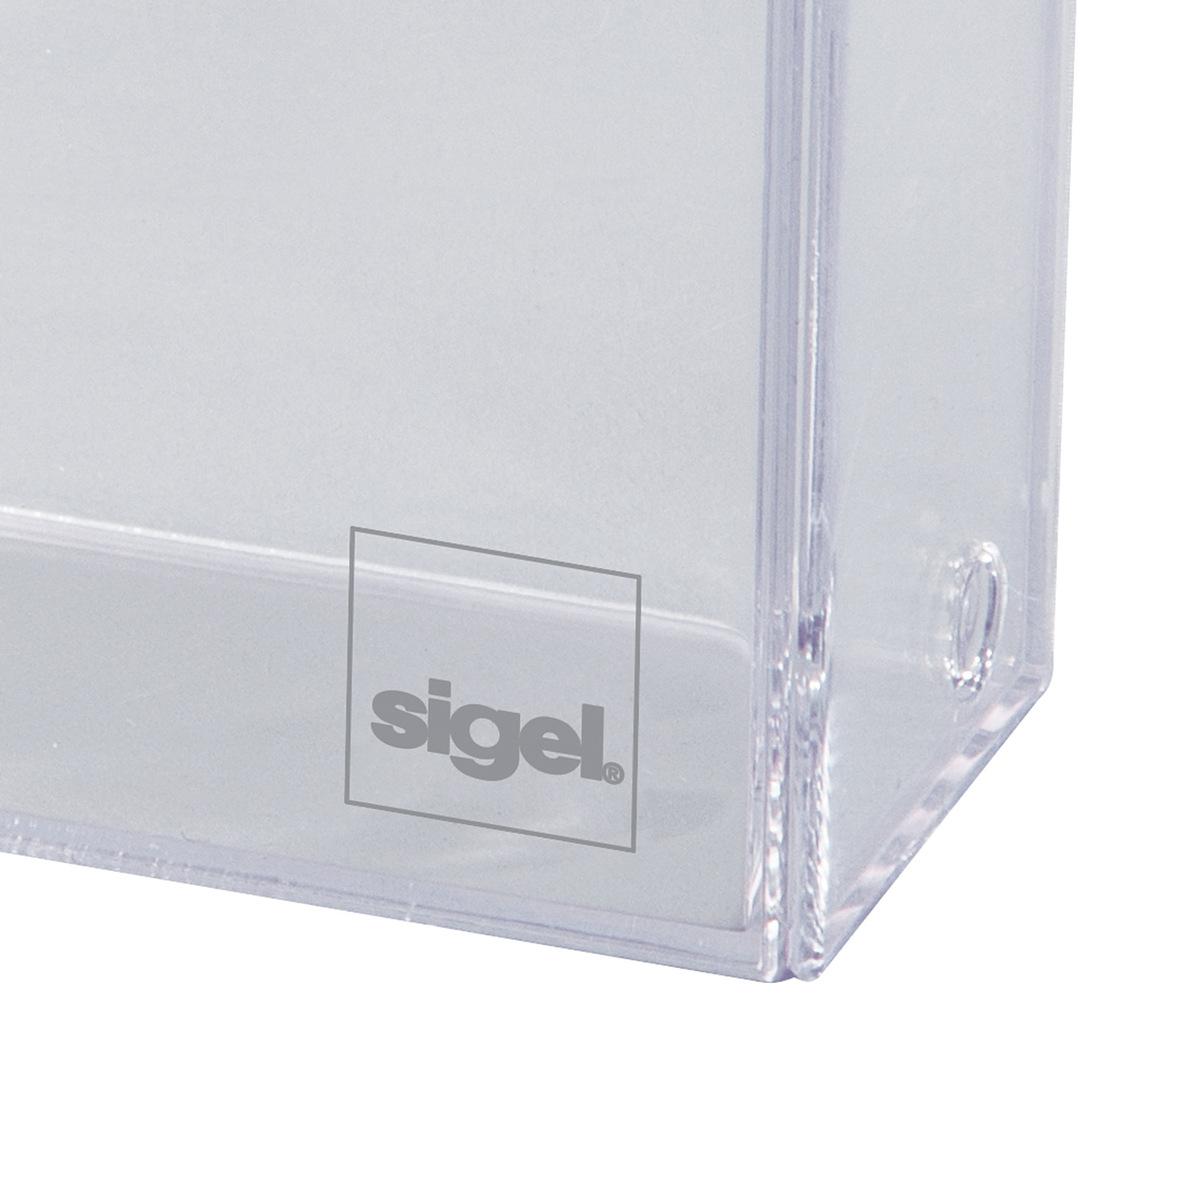 Visitenkarten Box Sigel